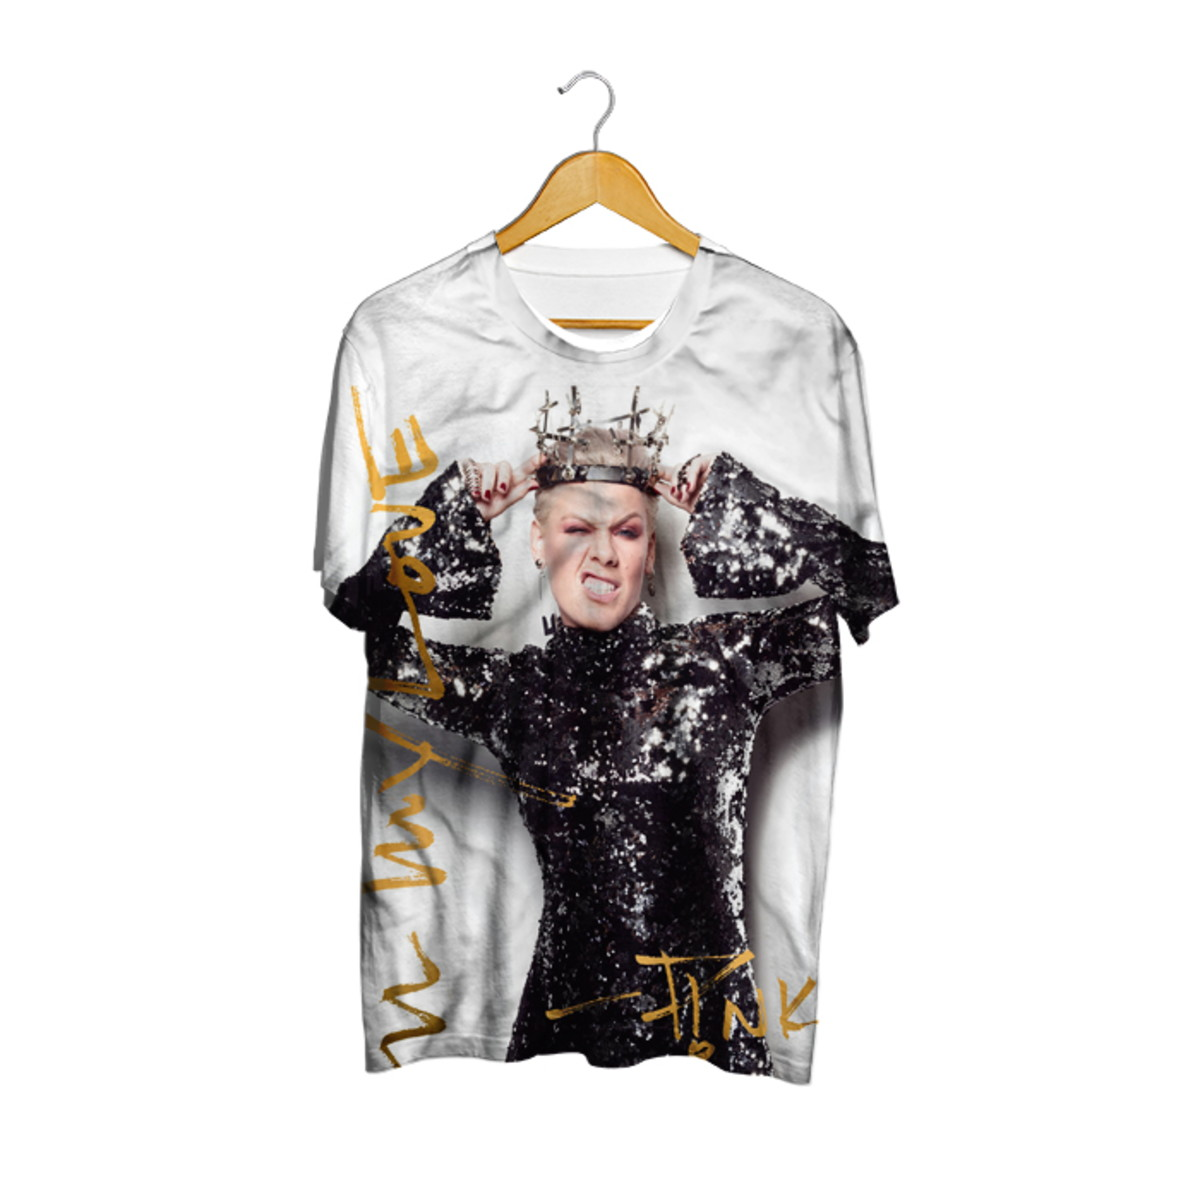 Camiseta Beautiful Trauma 2019 - P!nk